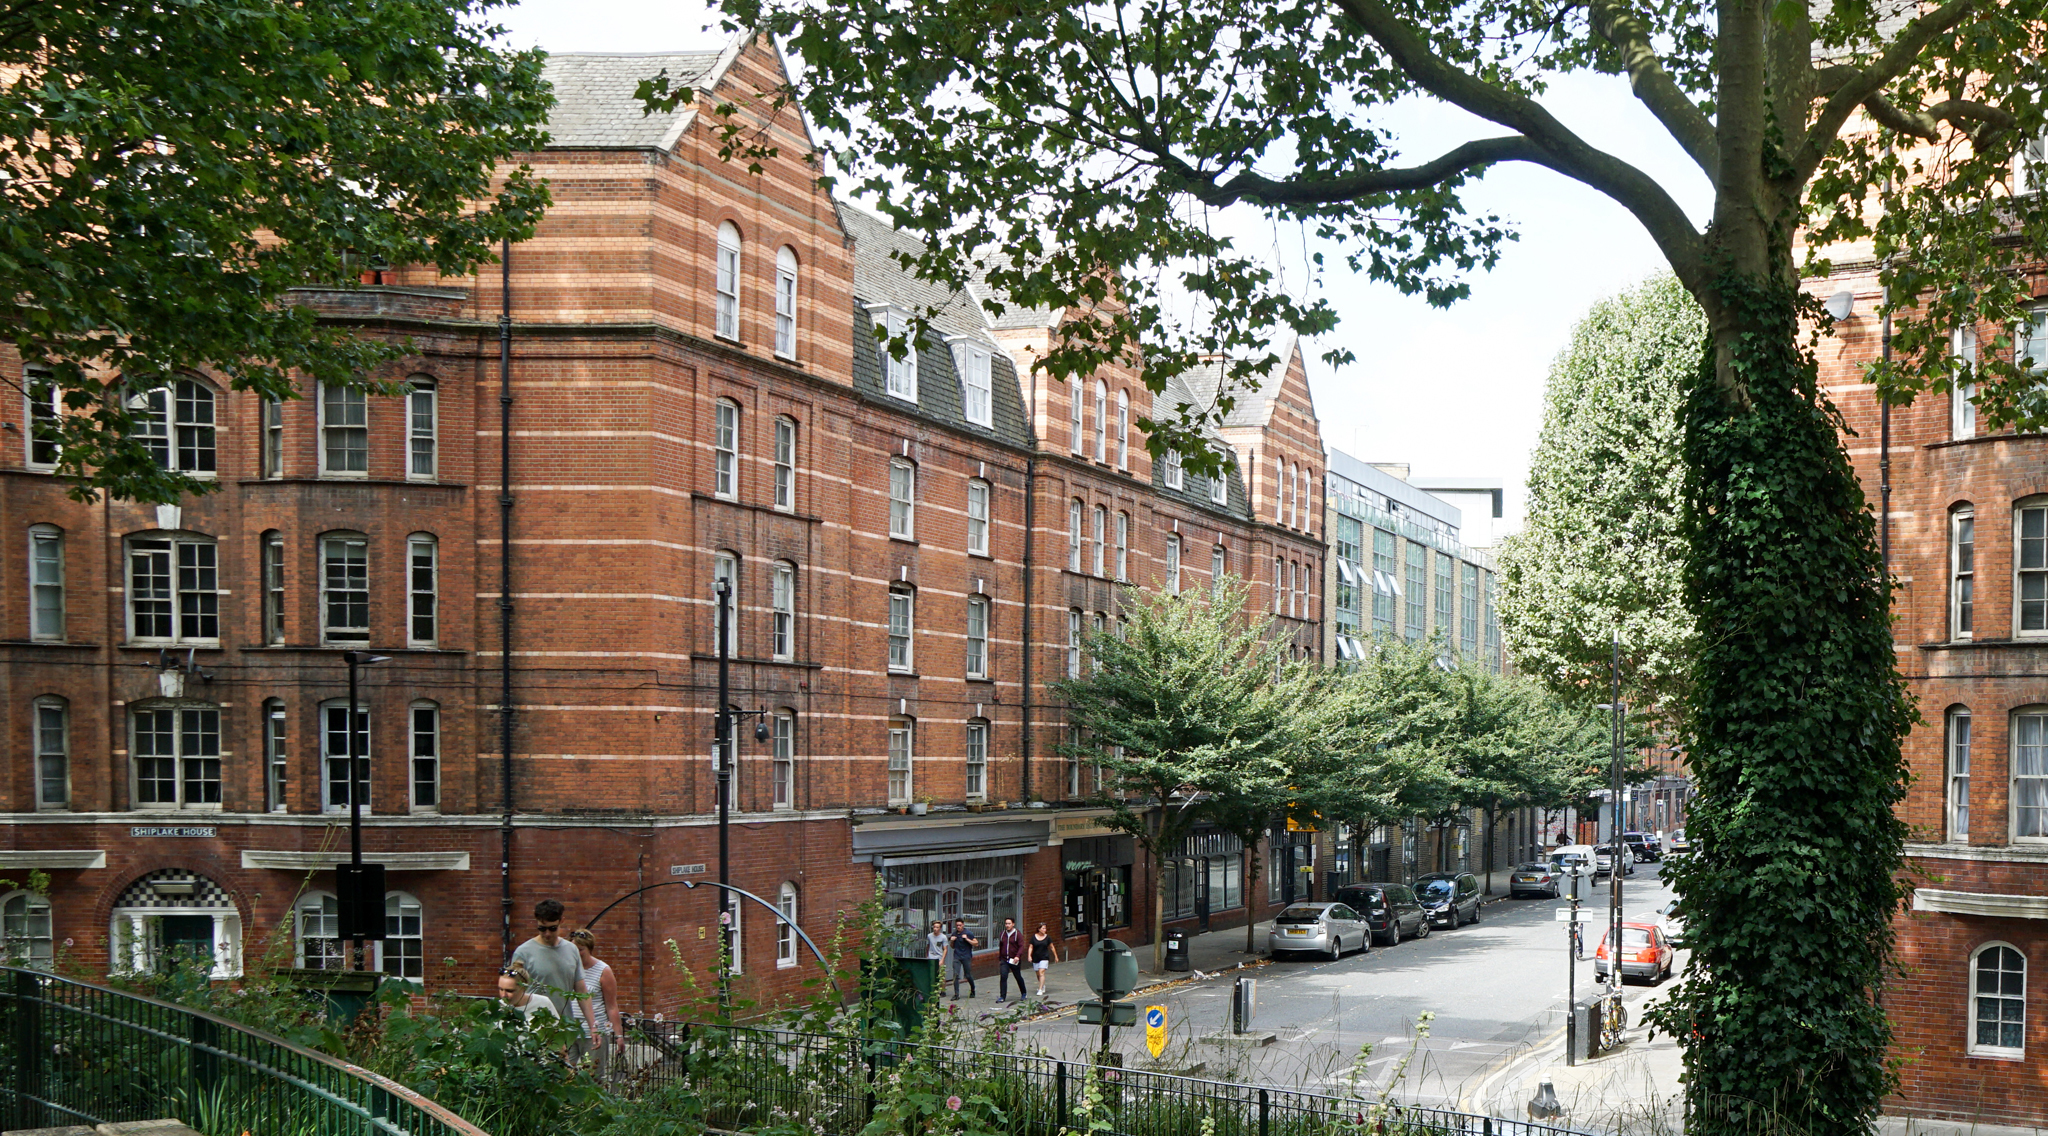 Best buildings in London: Boundary Estate